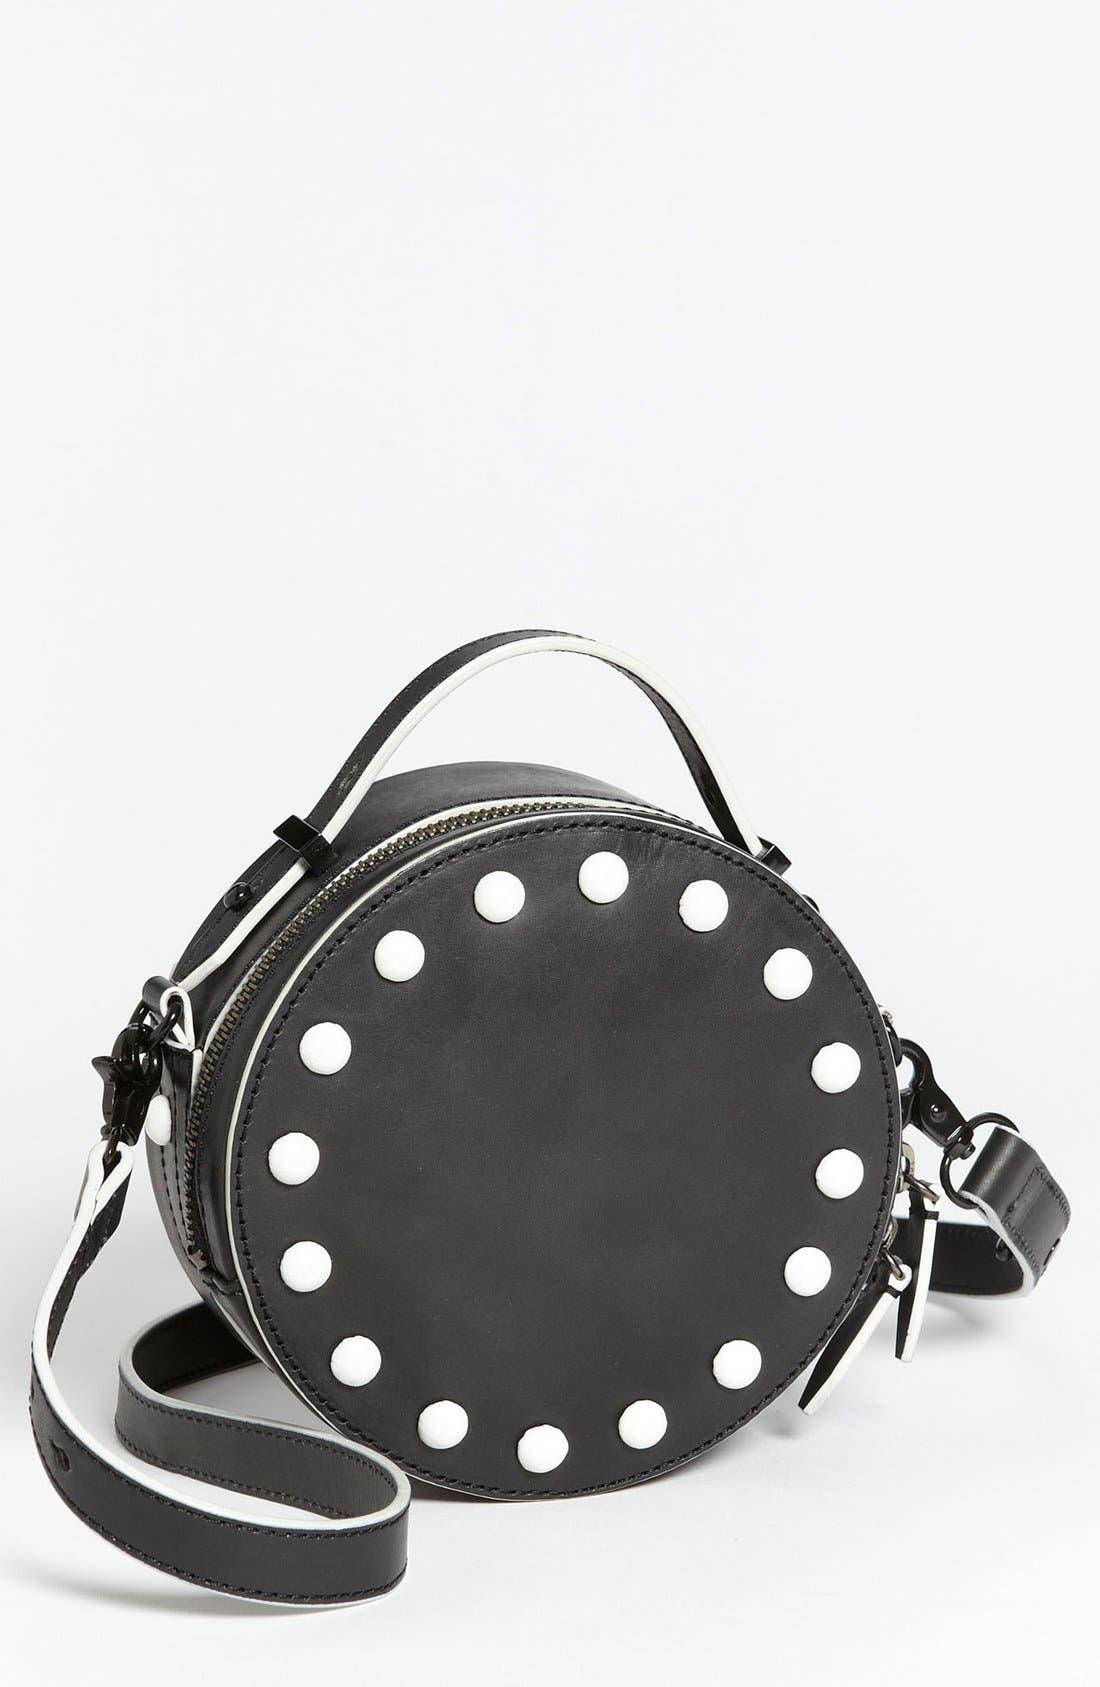 Alternate Image 1 Selected - Loeffler Randall 'Circle' Leather Crossbody Bag, Small